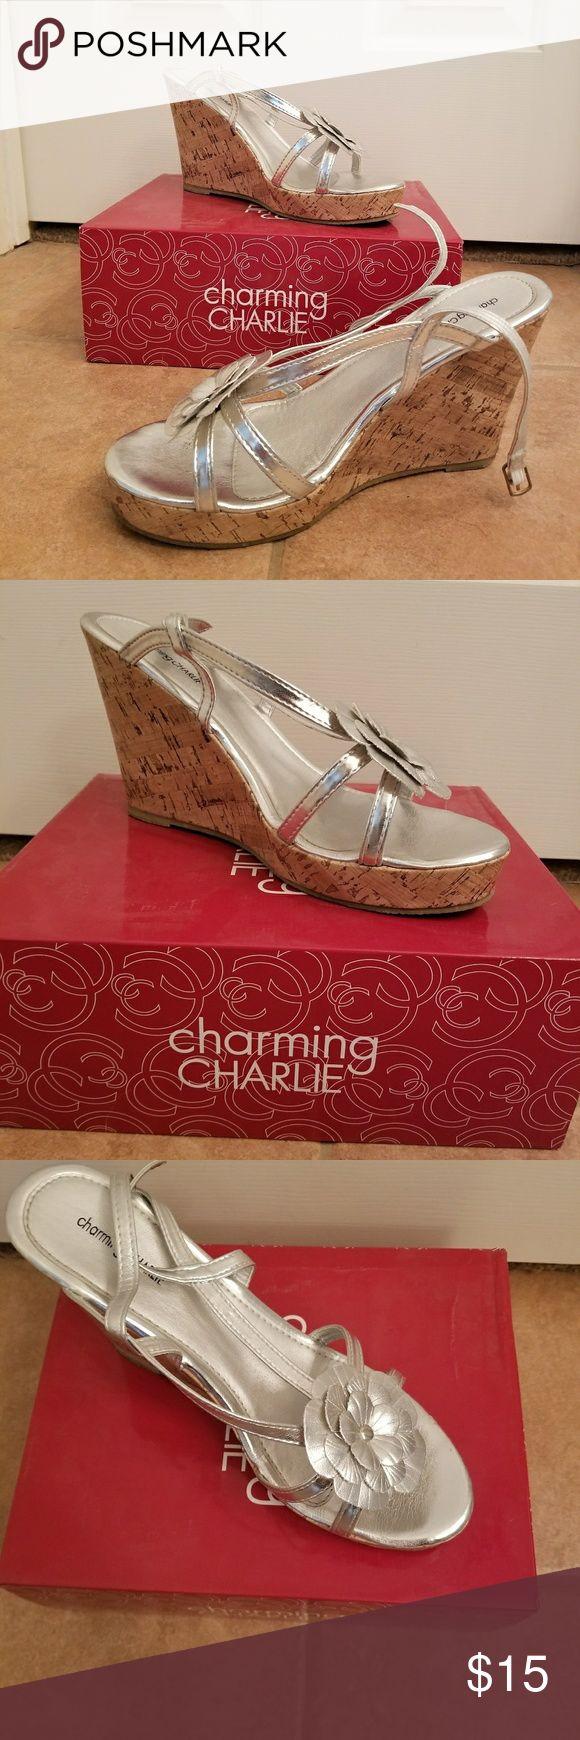 Charming Charlie Nancy silver wedge sandal Silver wedge sandals Charming Charlie Shoes Wedges